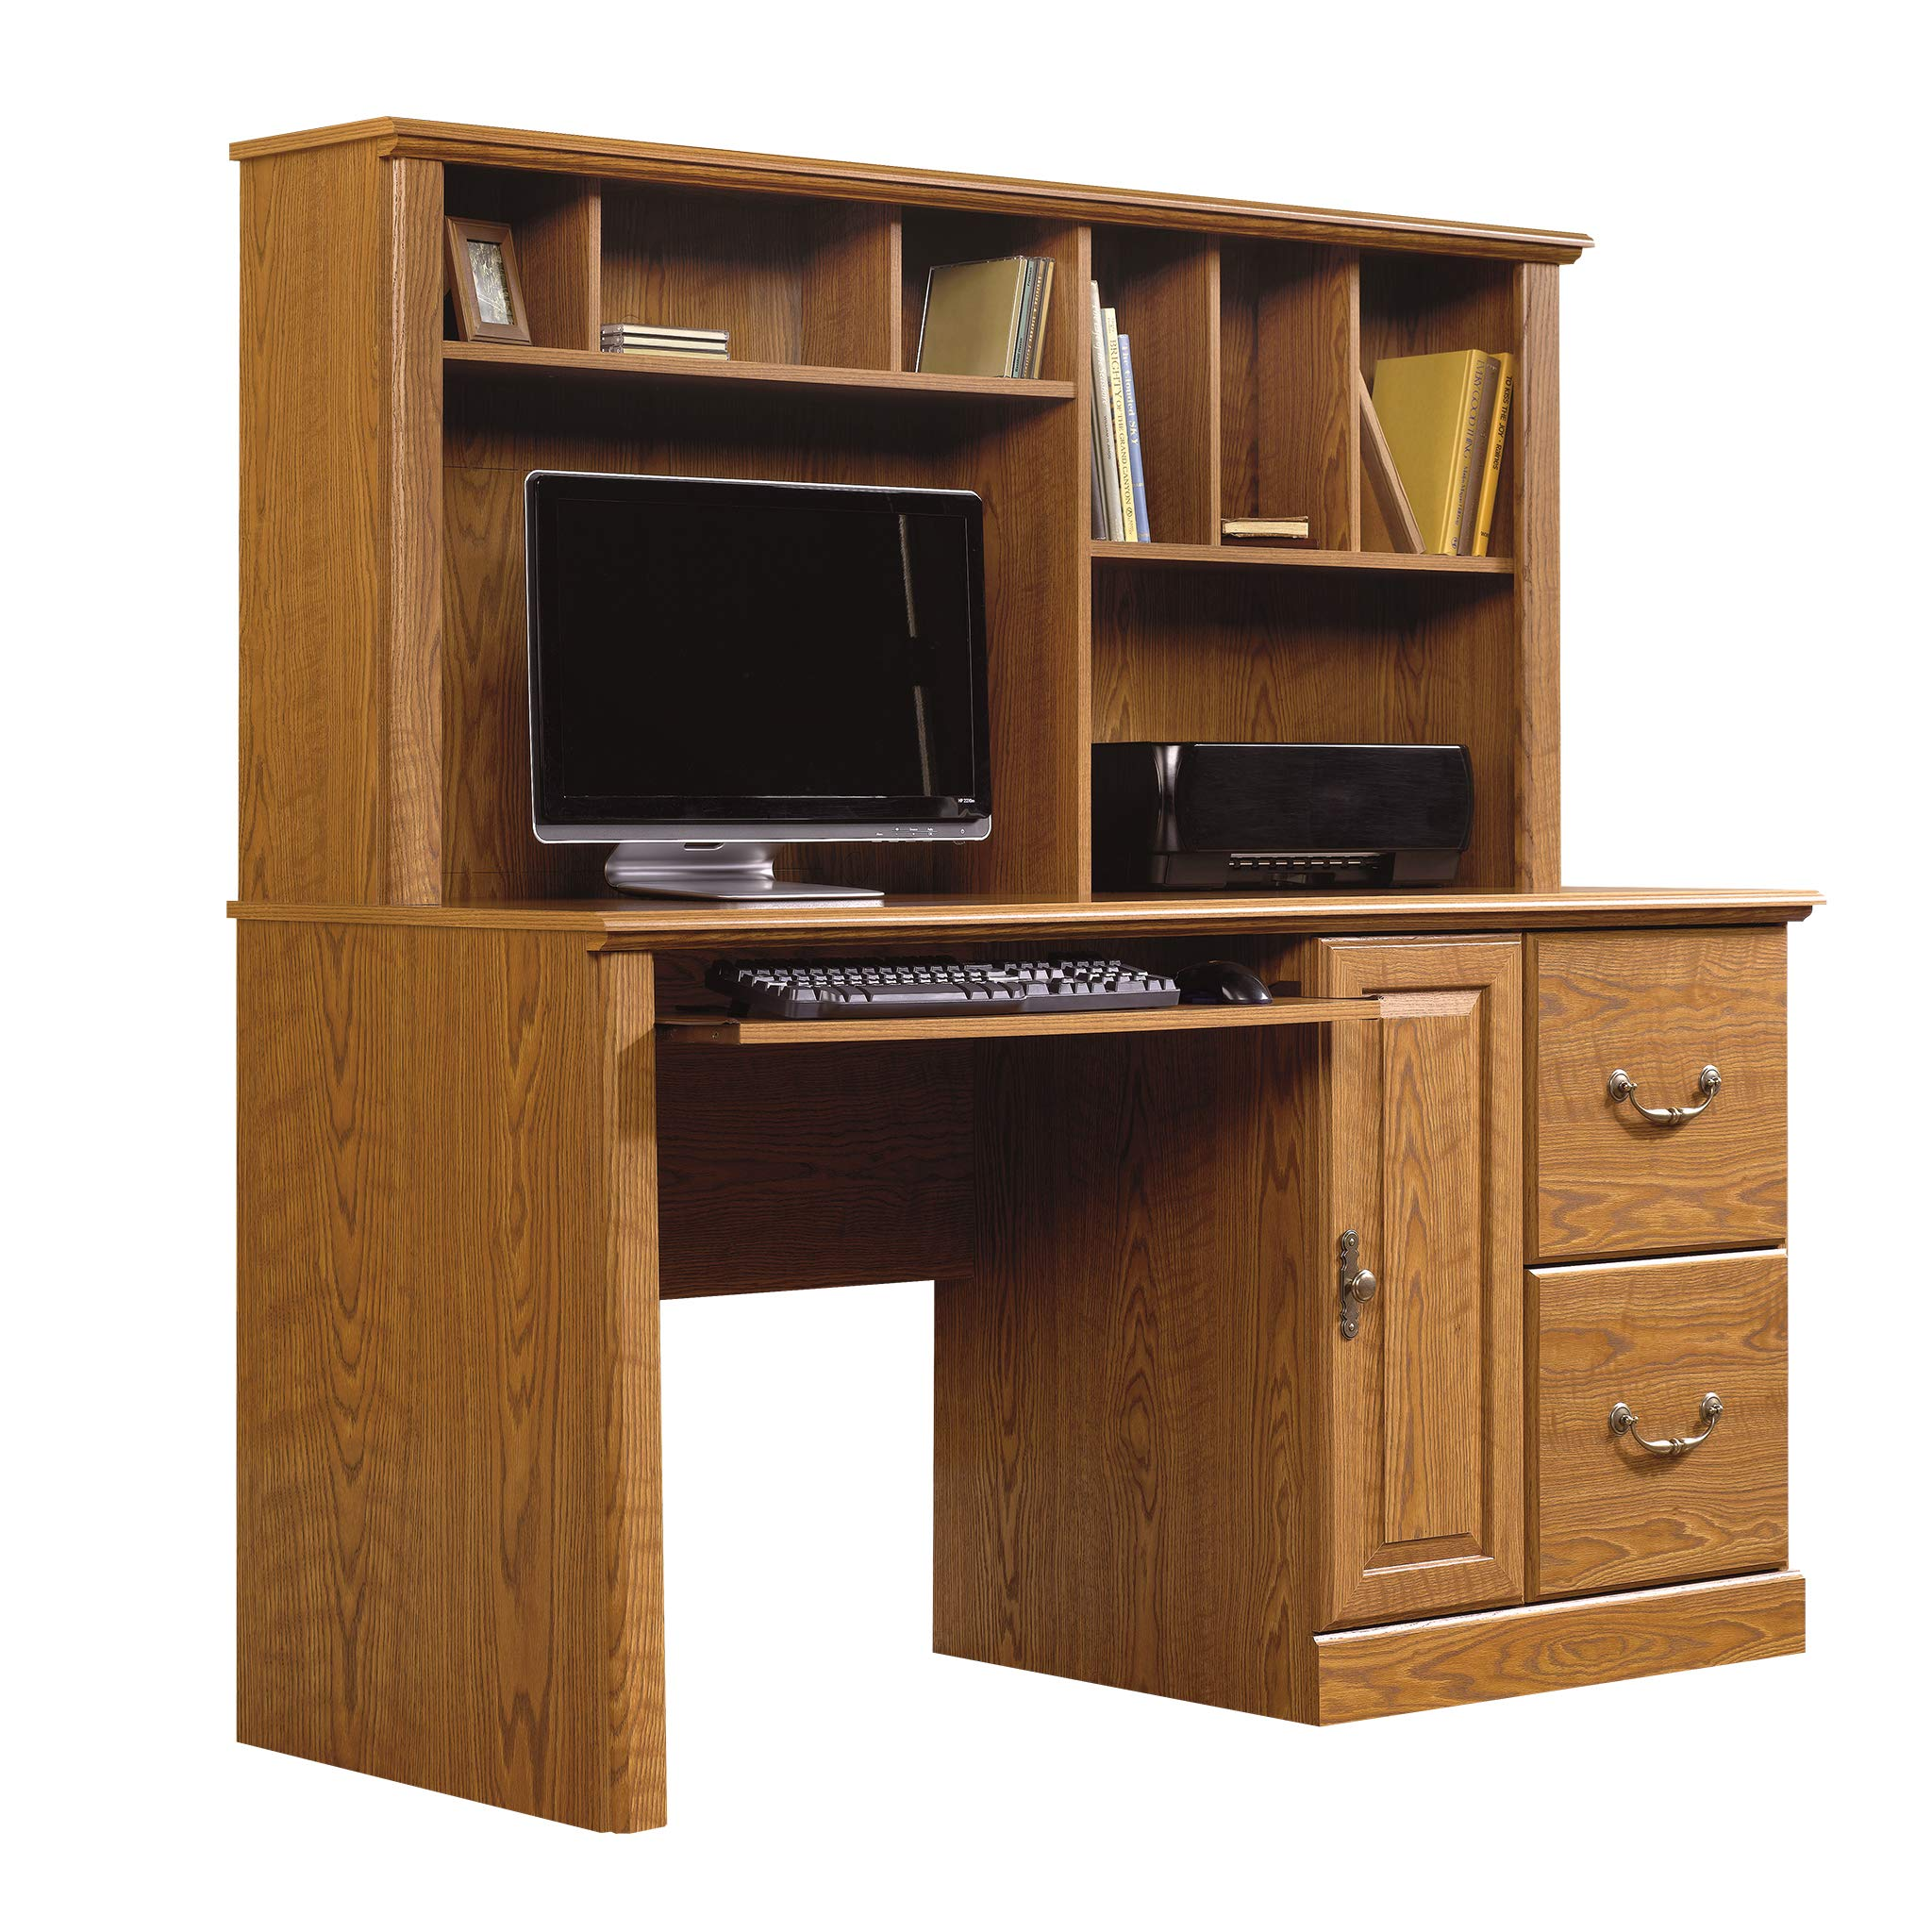 Sauder 401354 Orchard Hills Computer Desk with Hutch, L: 58.74'' x D: 23.47'' x H: 57.24'', Carolina Oak finish